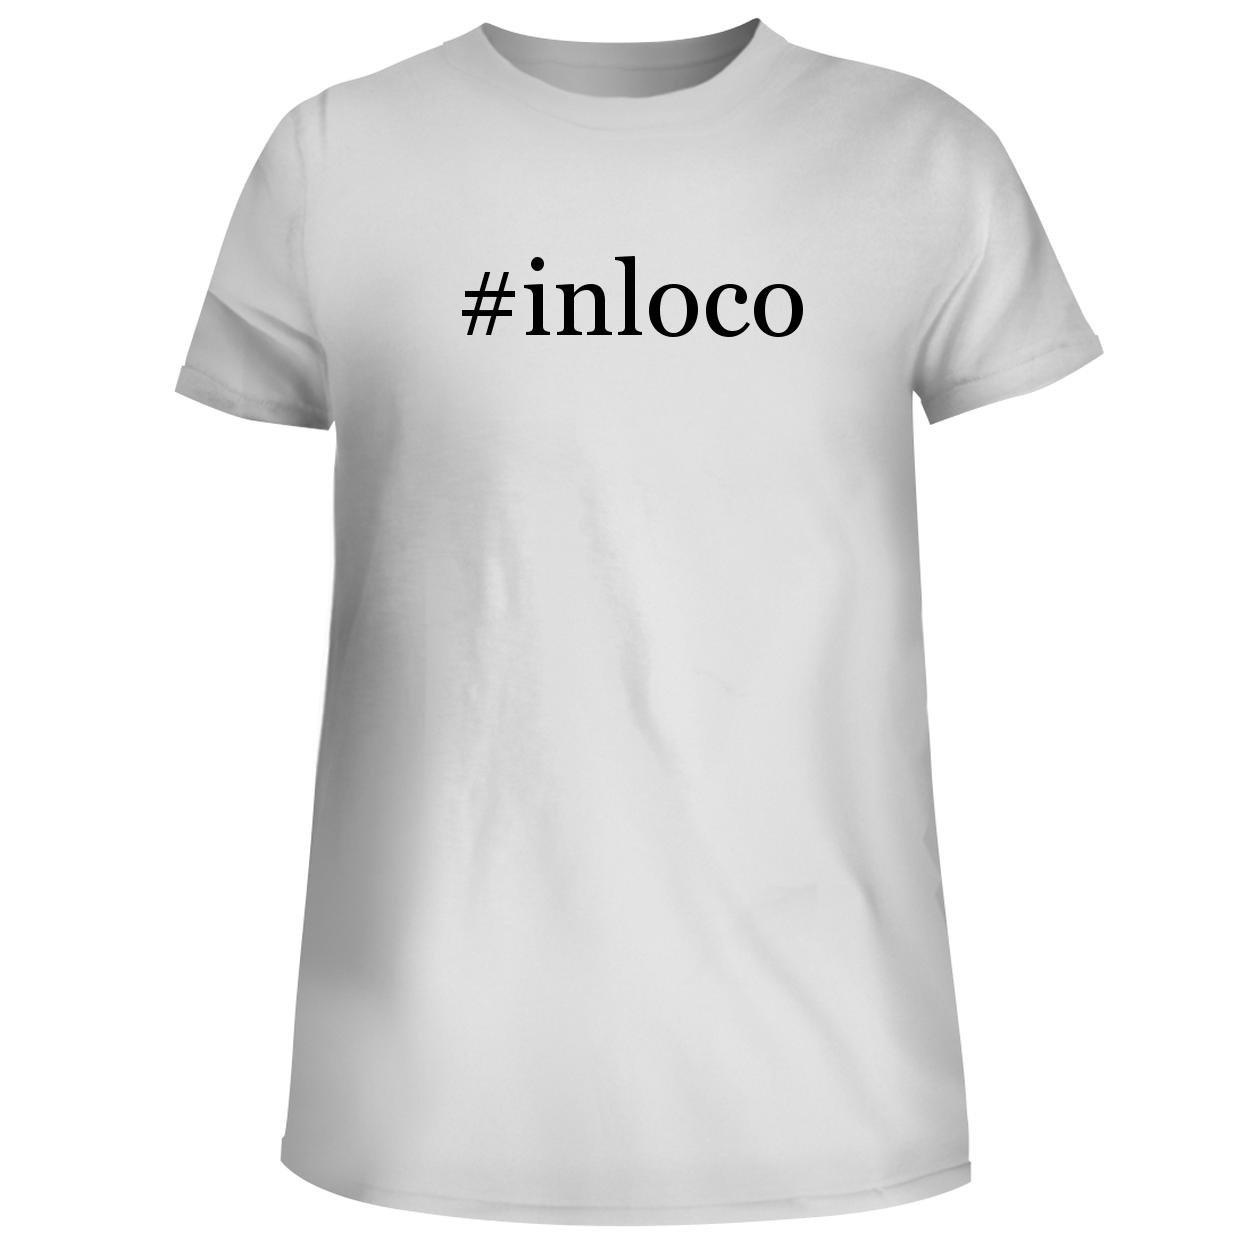 Inloco Cute Graphic Tee 2306 Shirts